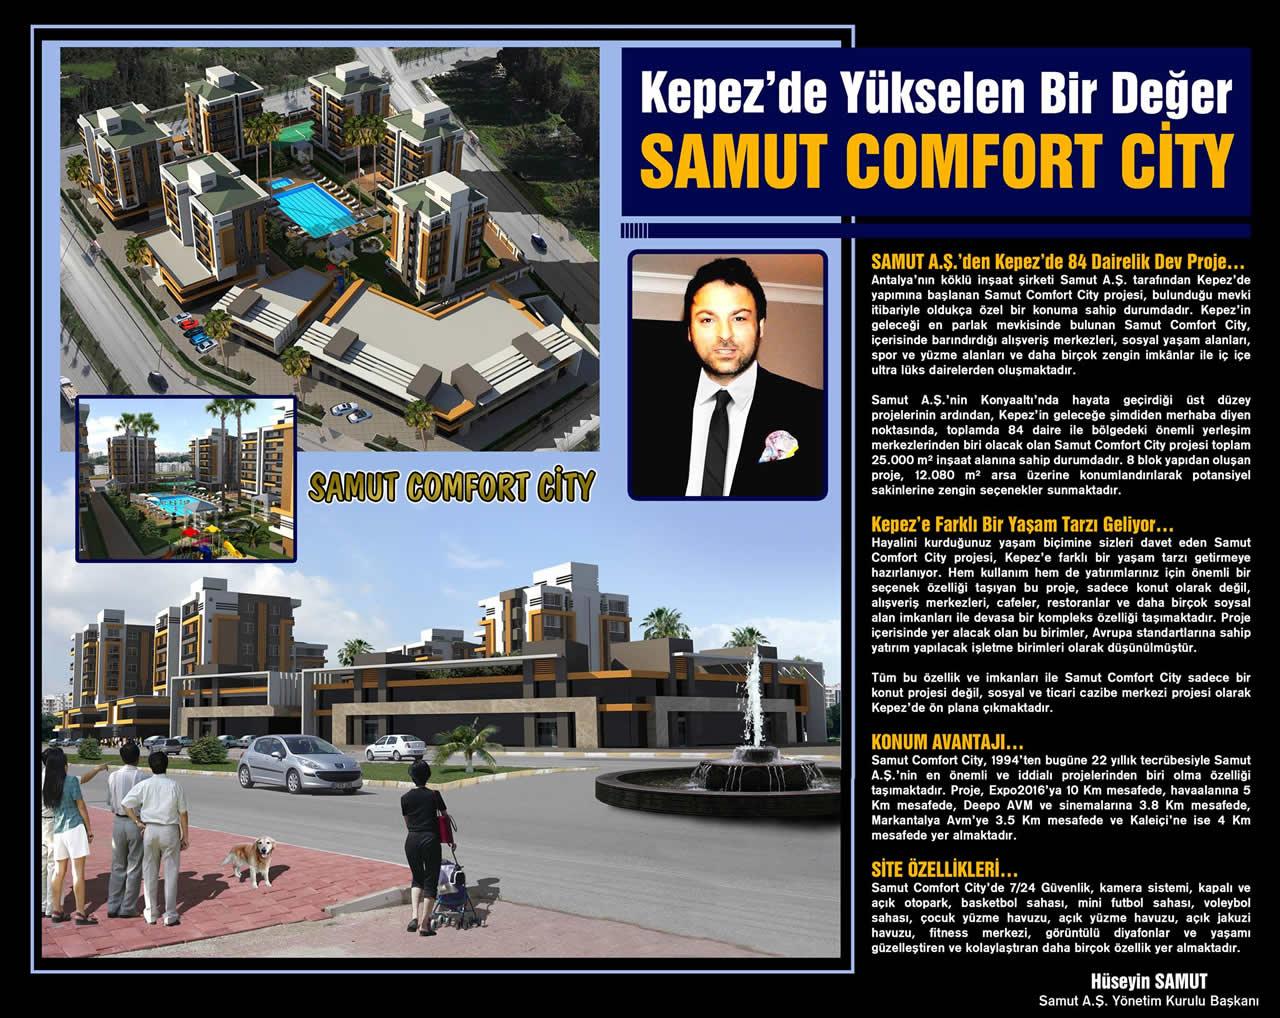 Samut Comfort City Kepez